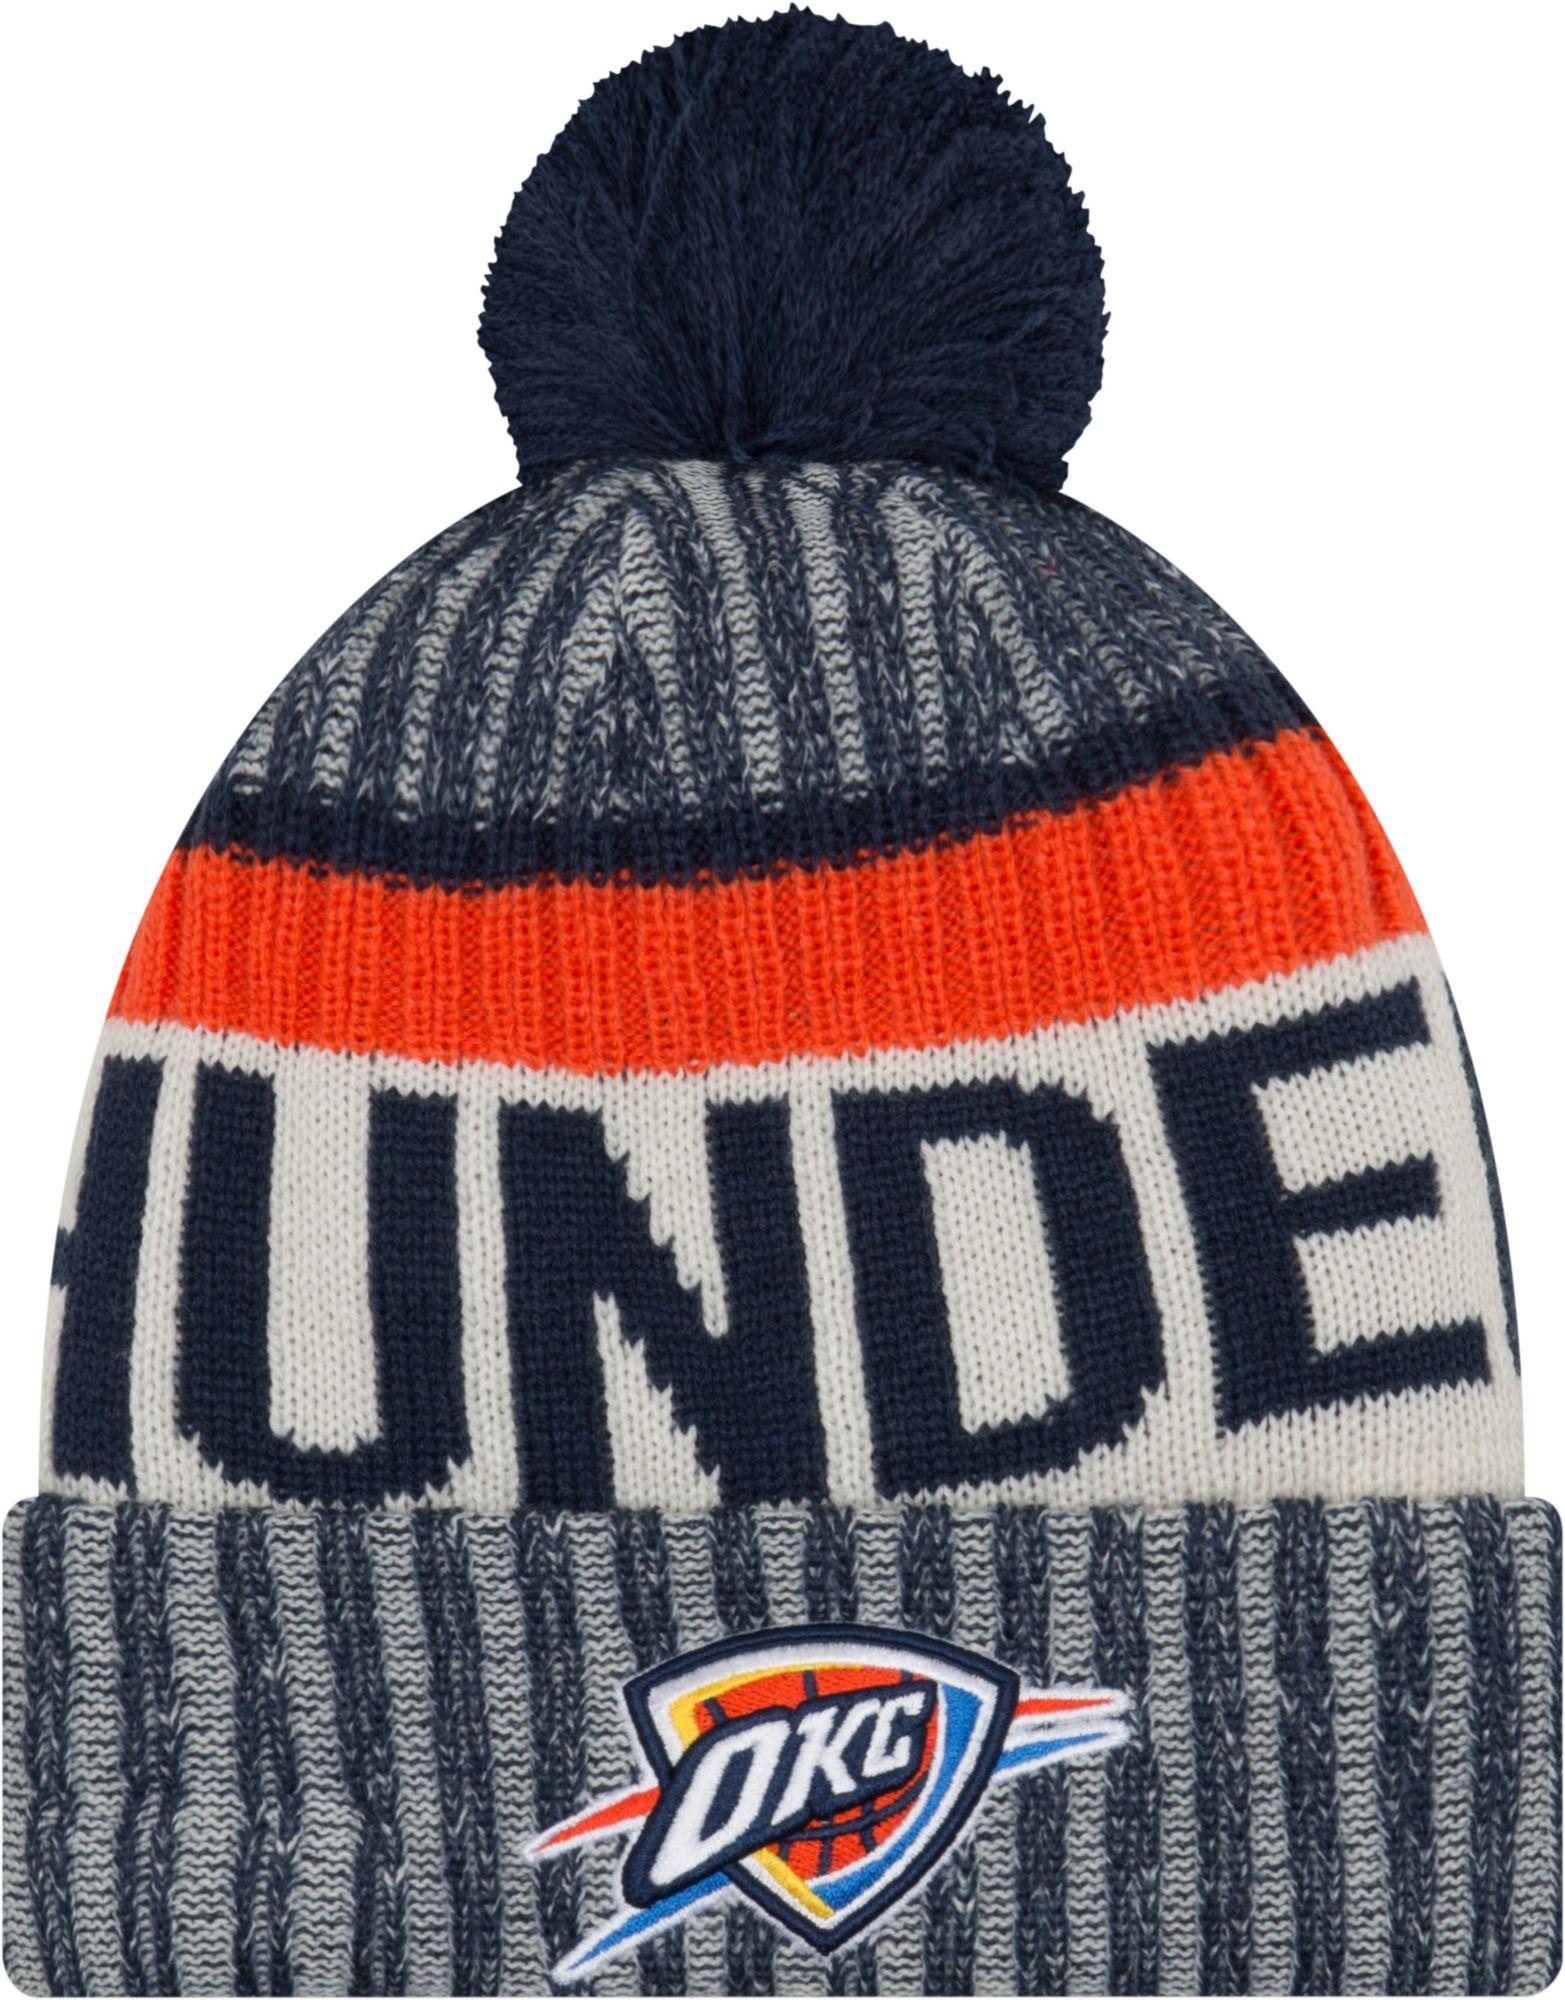 515c92997e9 ... order new era mens oklahoma city thunder knit hat b5f96 0e5ac